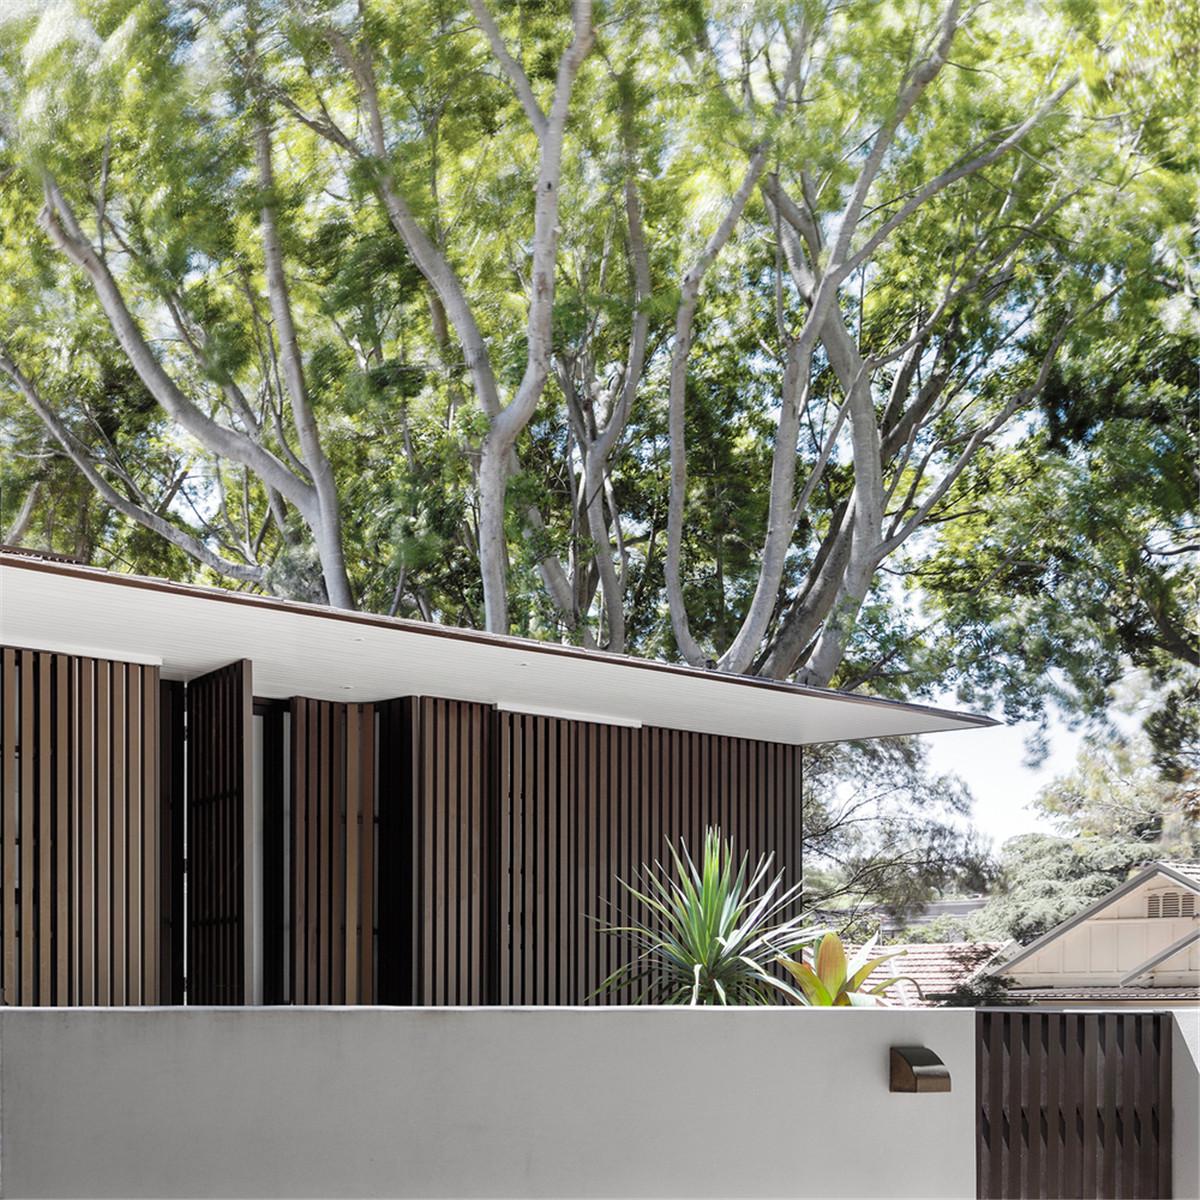 luigi_rosselli_architects___the_new_twin_peaks___003_副本.jpg